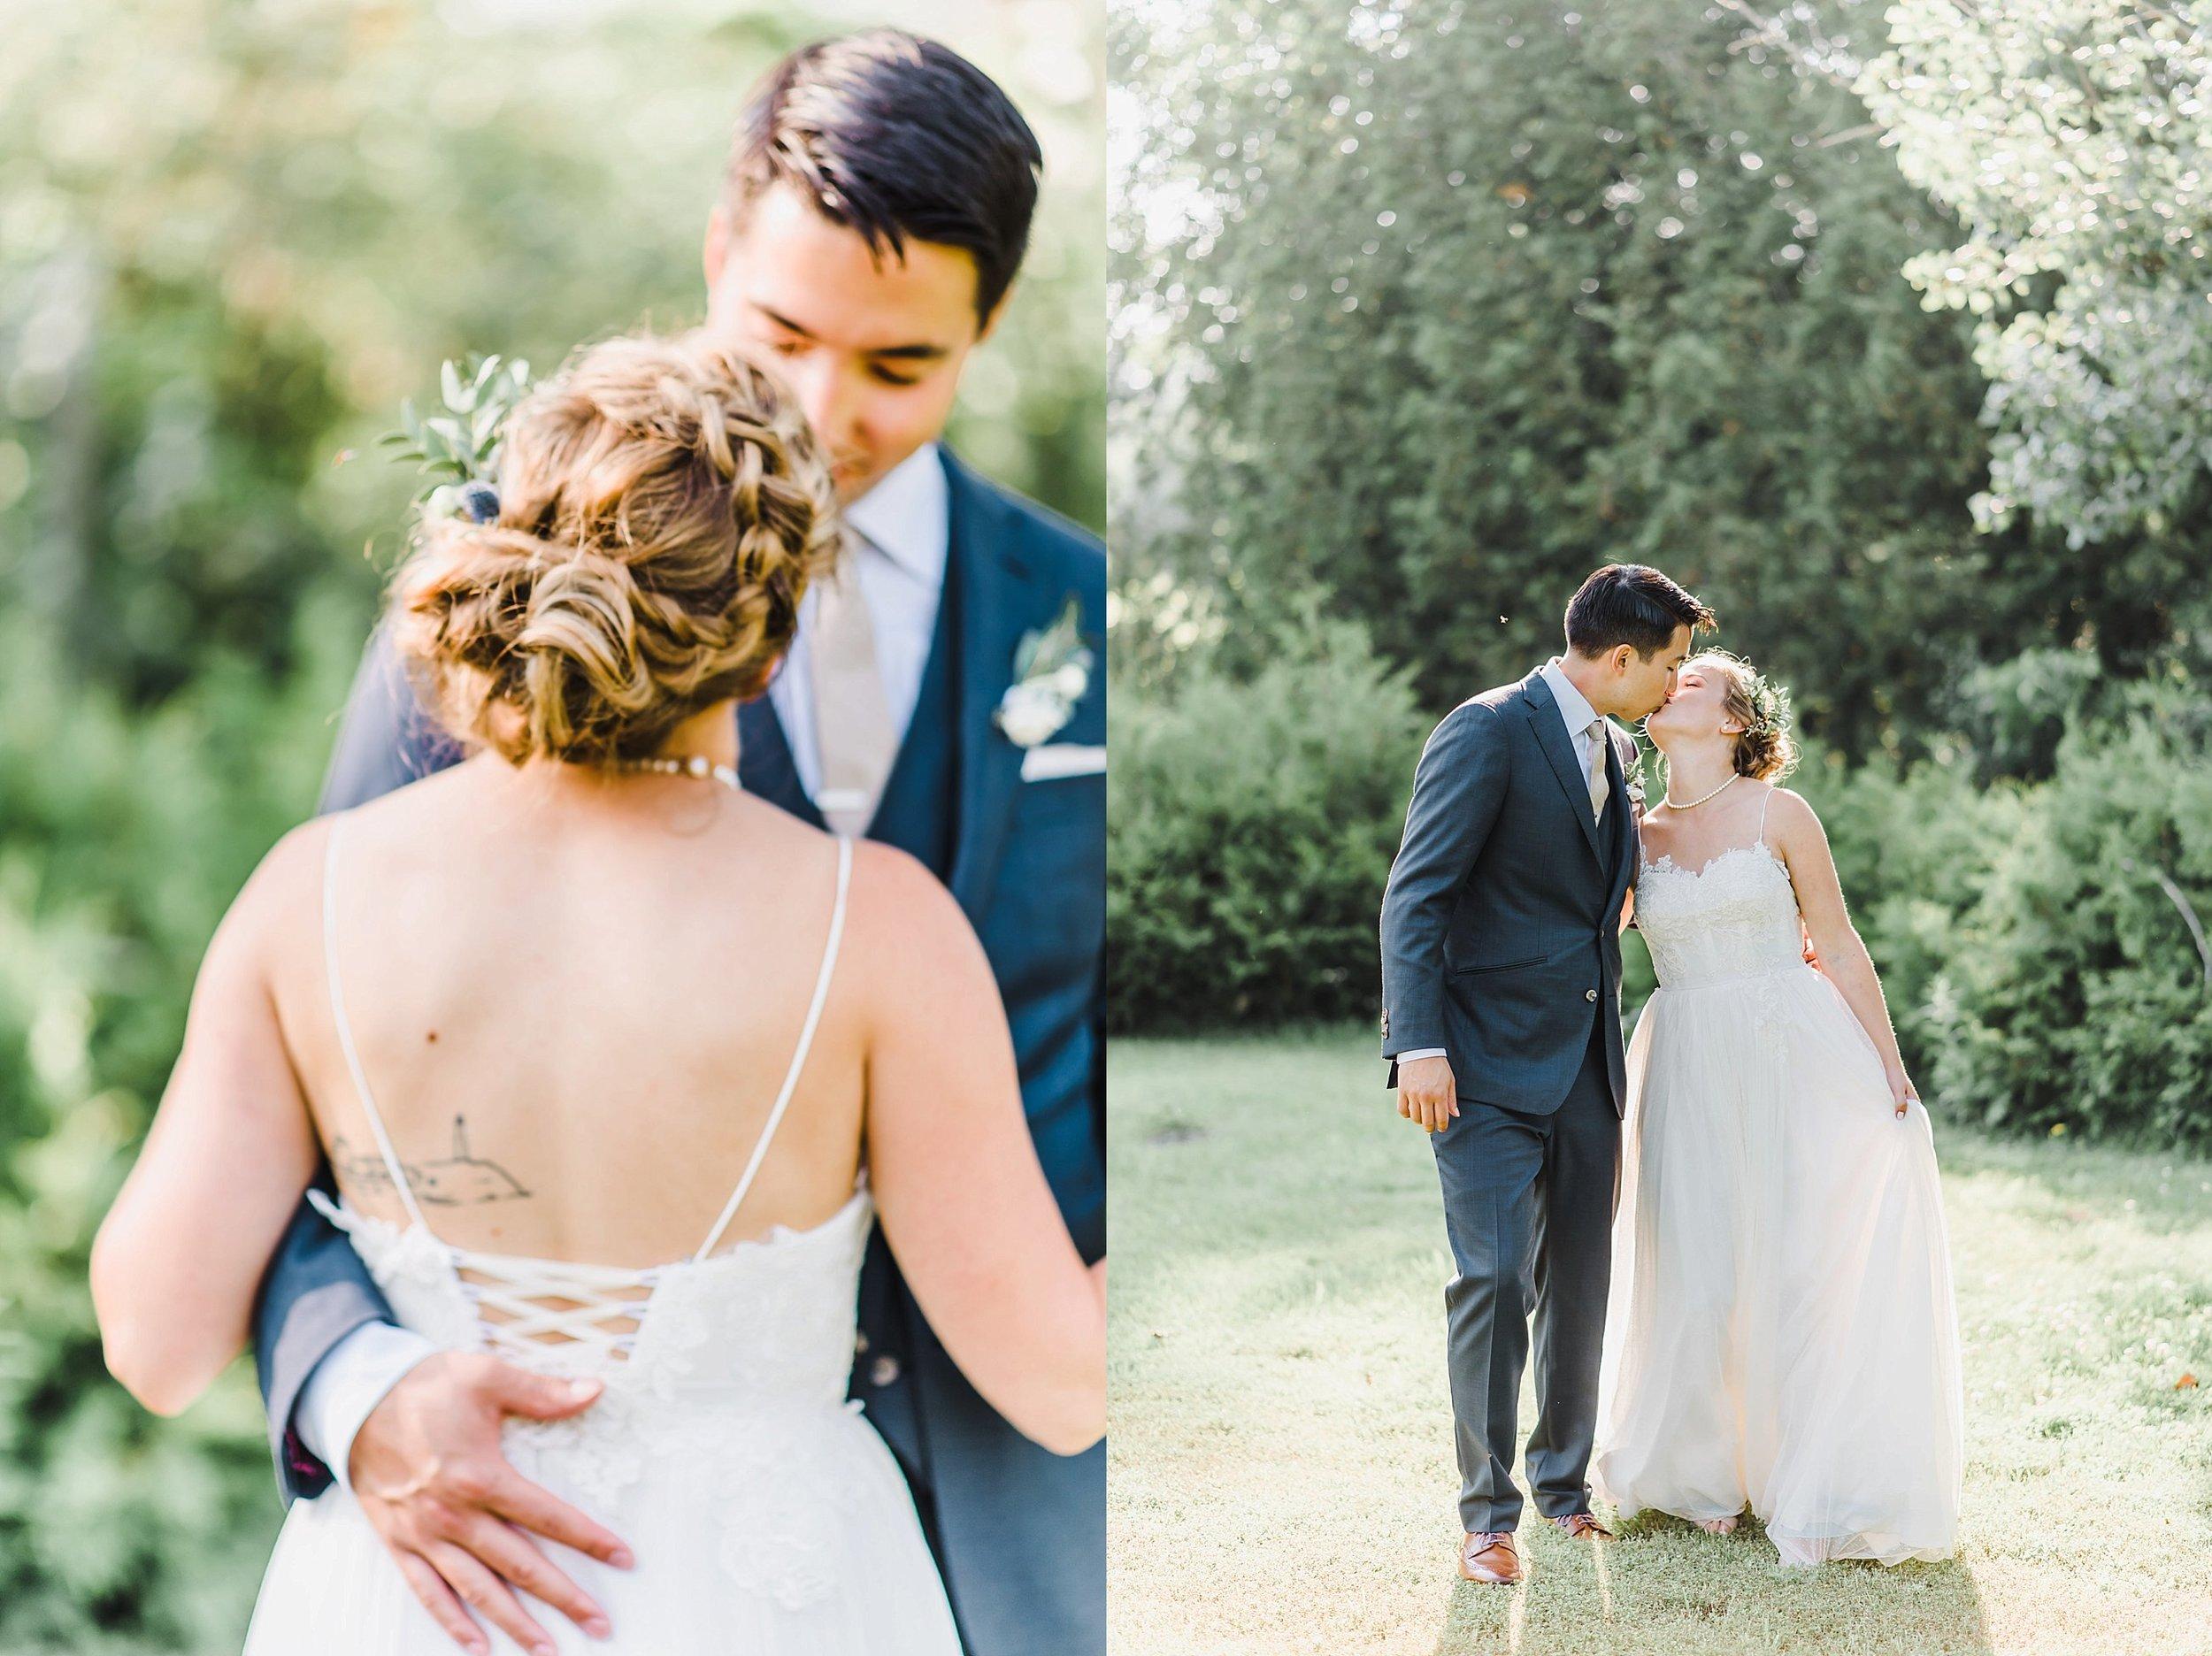 light airy indie fine art ottawa wedding photographer | Ali and Batoul Photography_0854.jpg